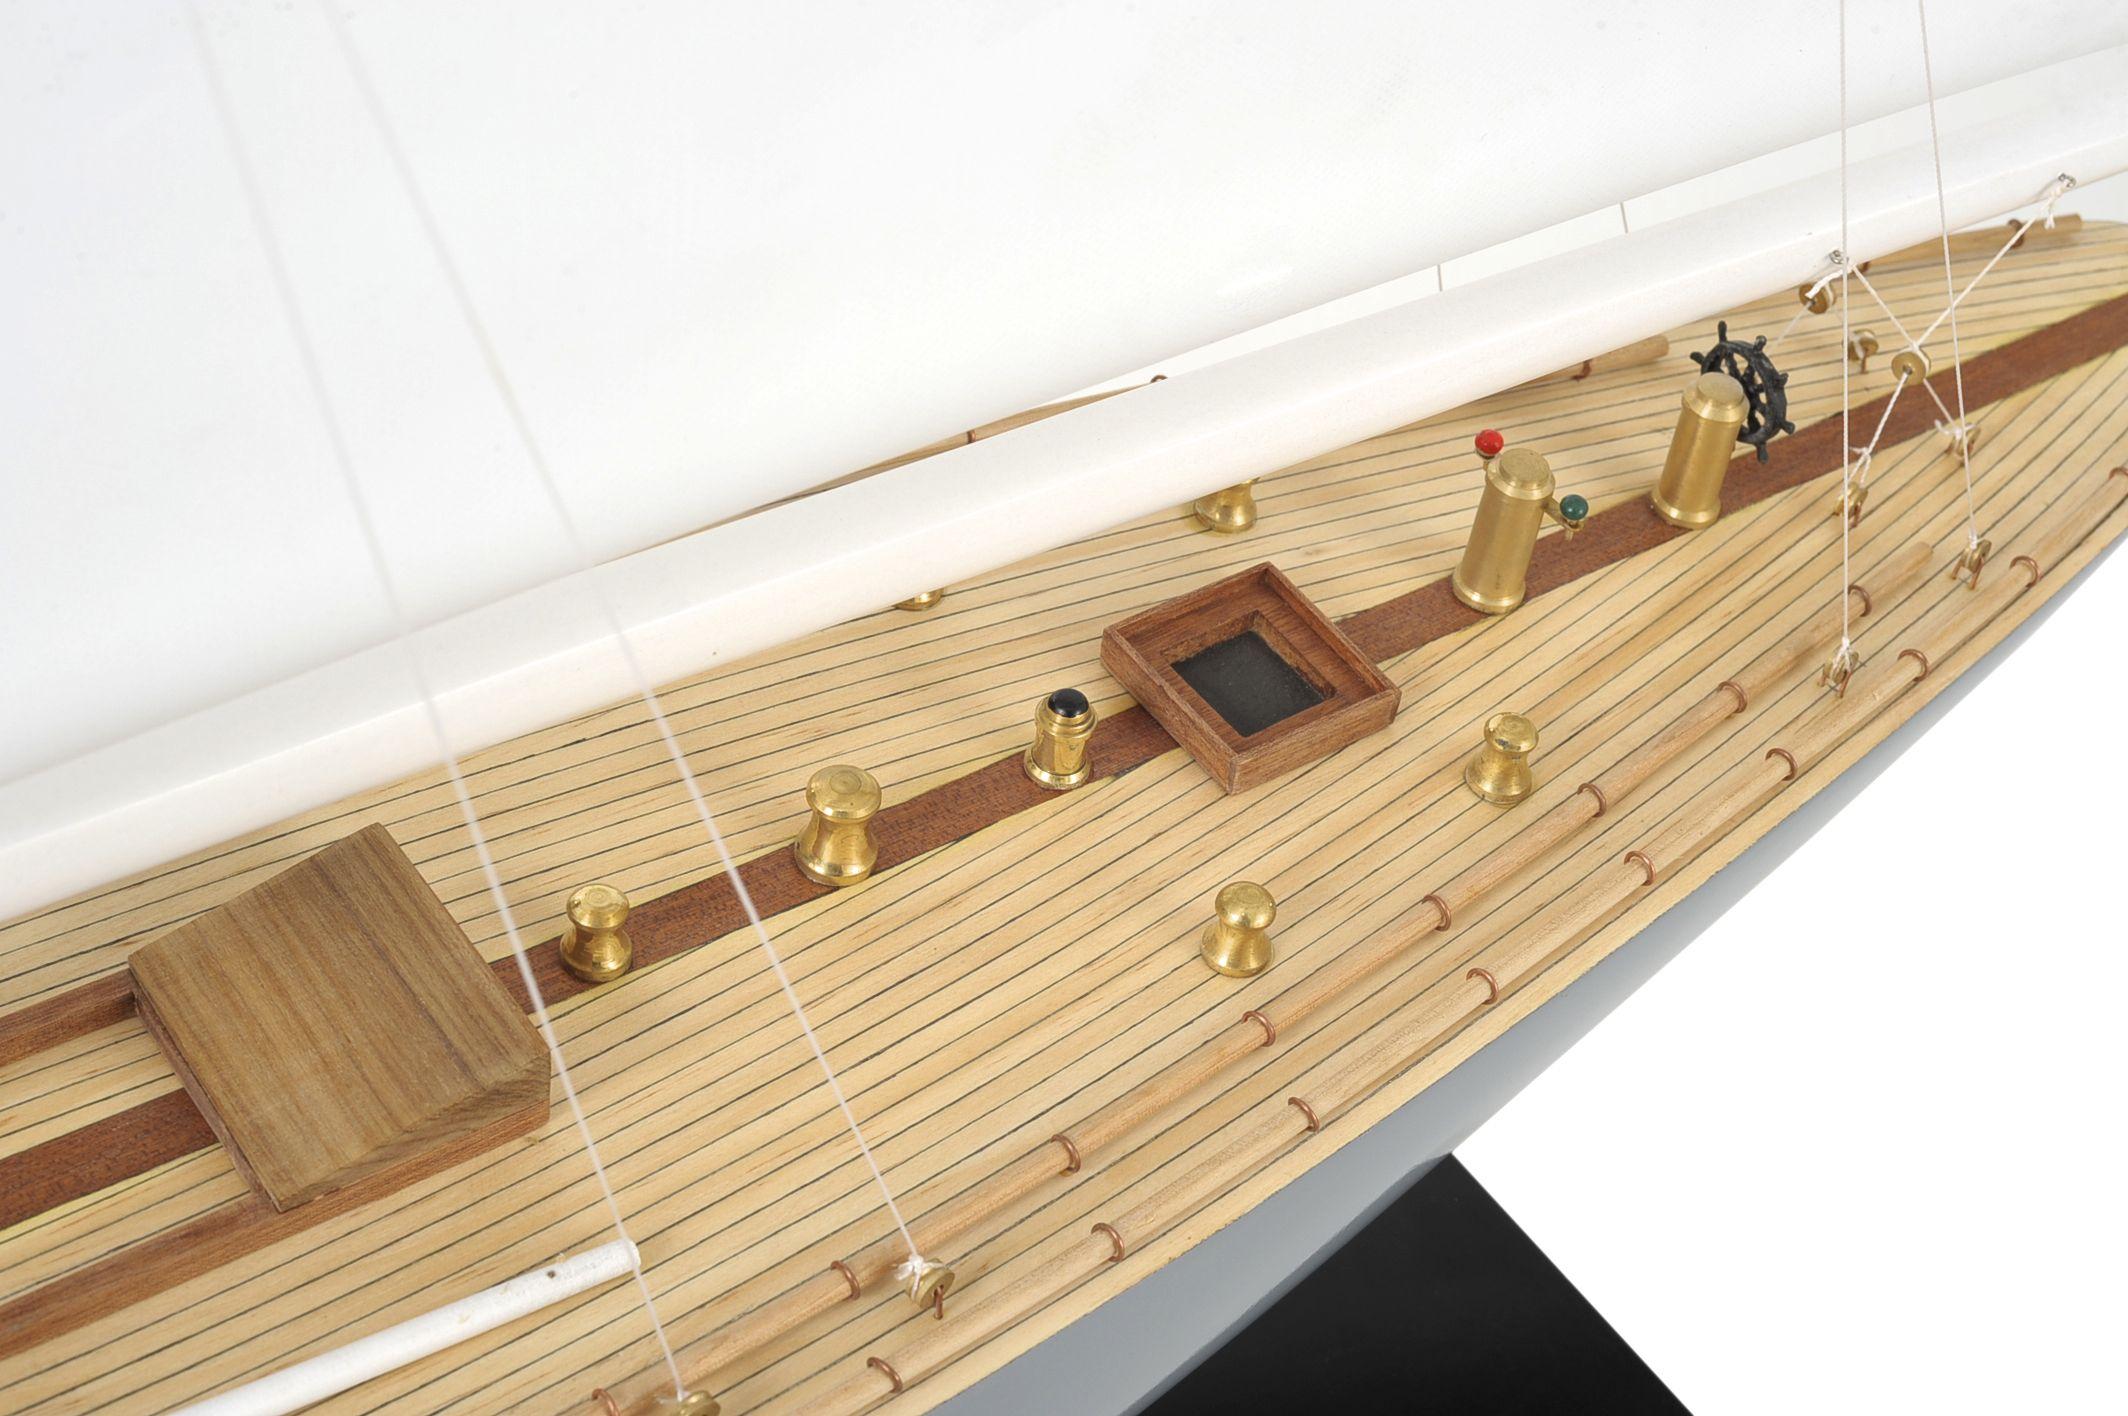 1519-8986-Enterprise-Model-Yacht